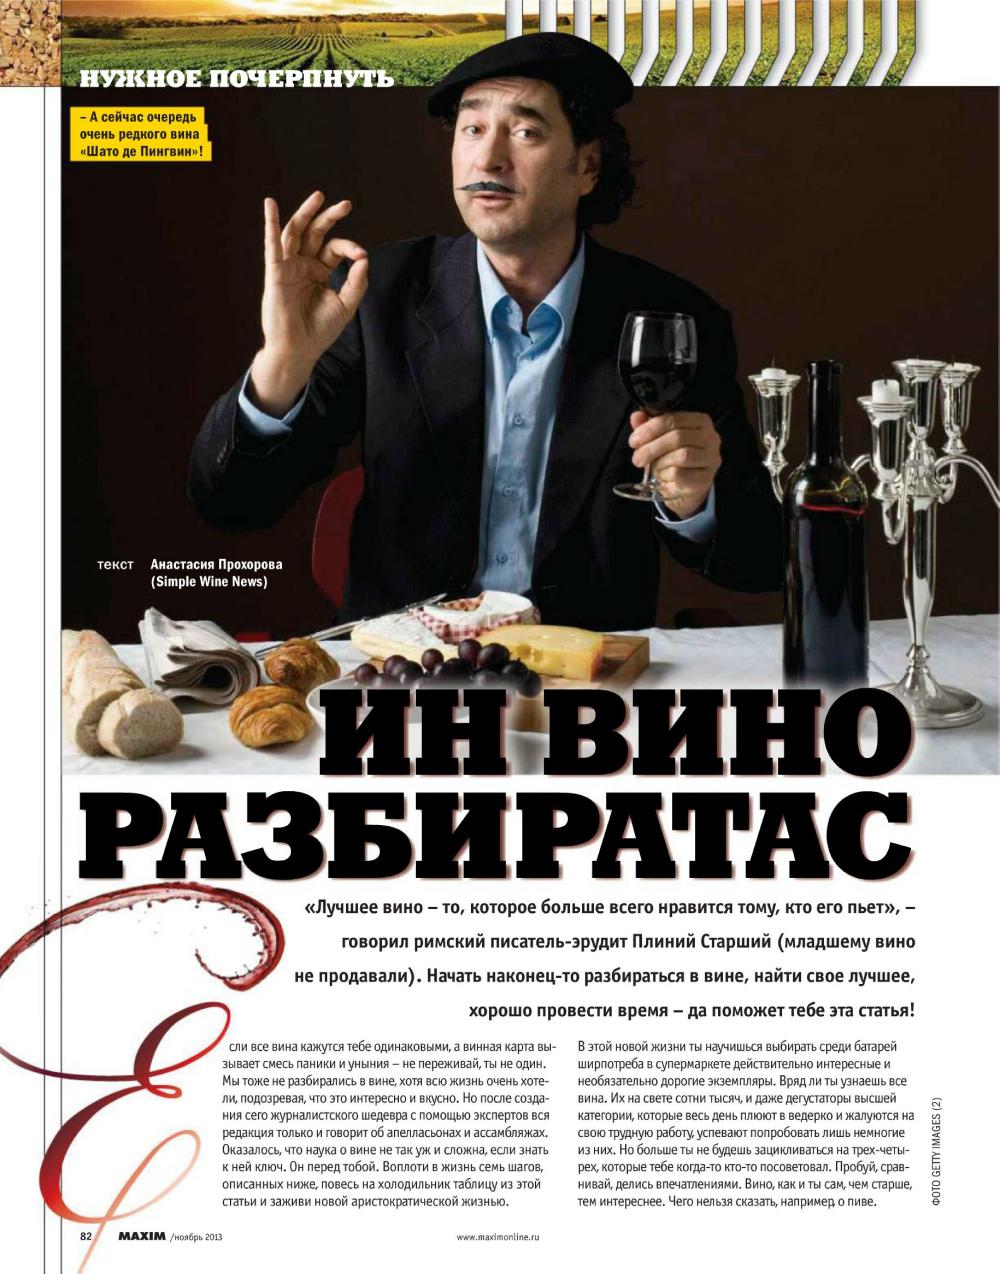 http://i2.imageban.ru/out/2013/10/15/c8487ff4497a029f6a4318b4b48711fd.jpg